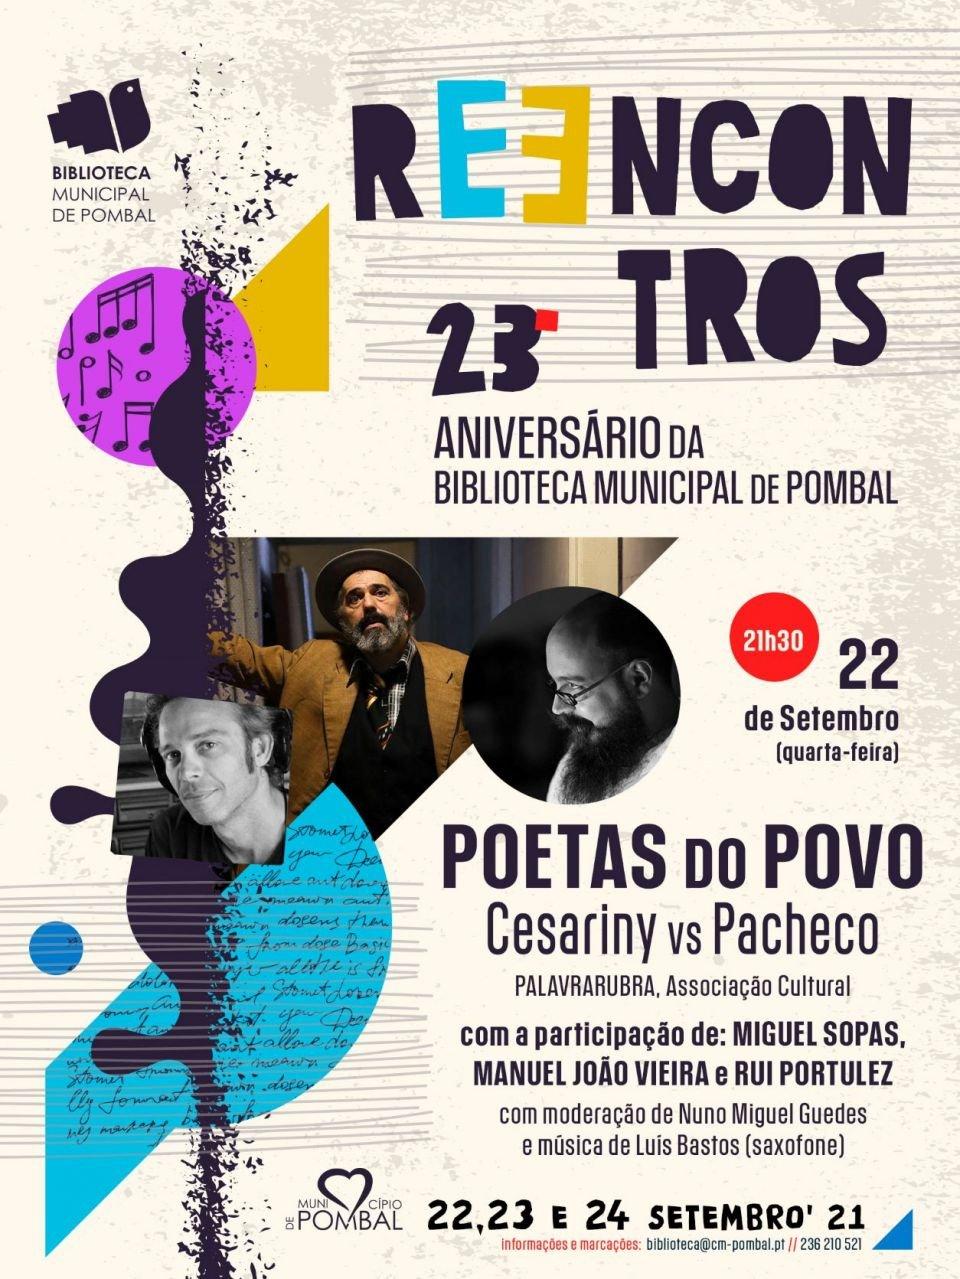 Poetas do Povo: Cesariny vs Pacheco